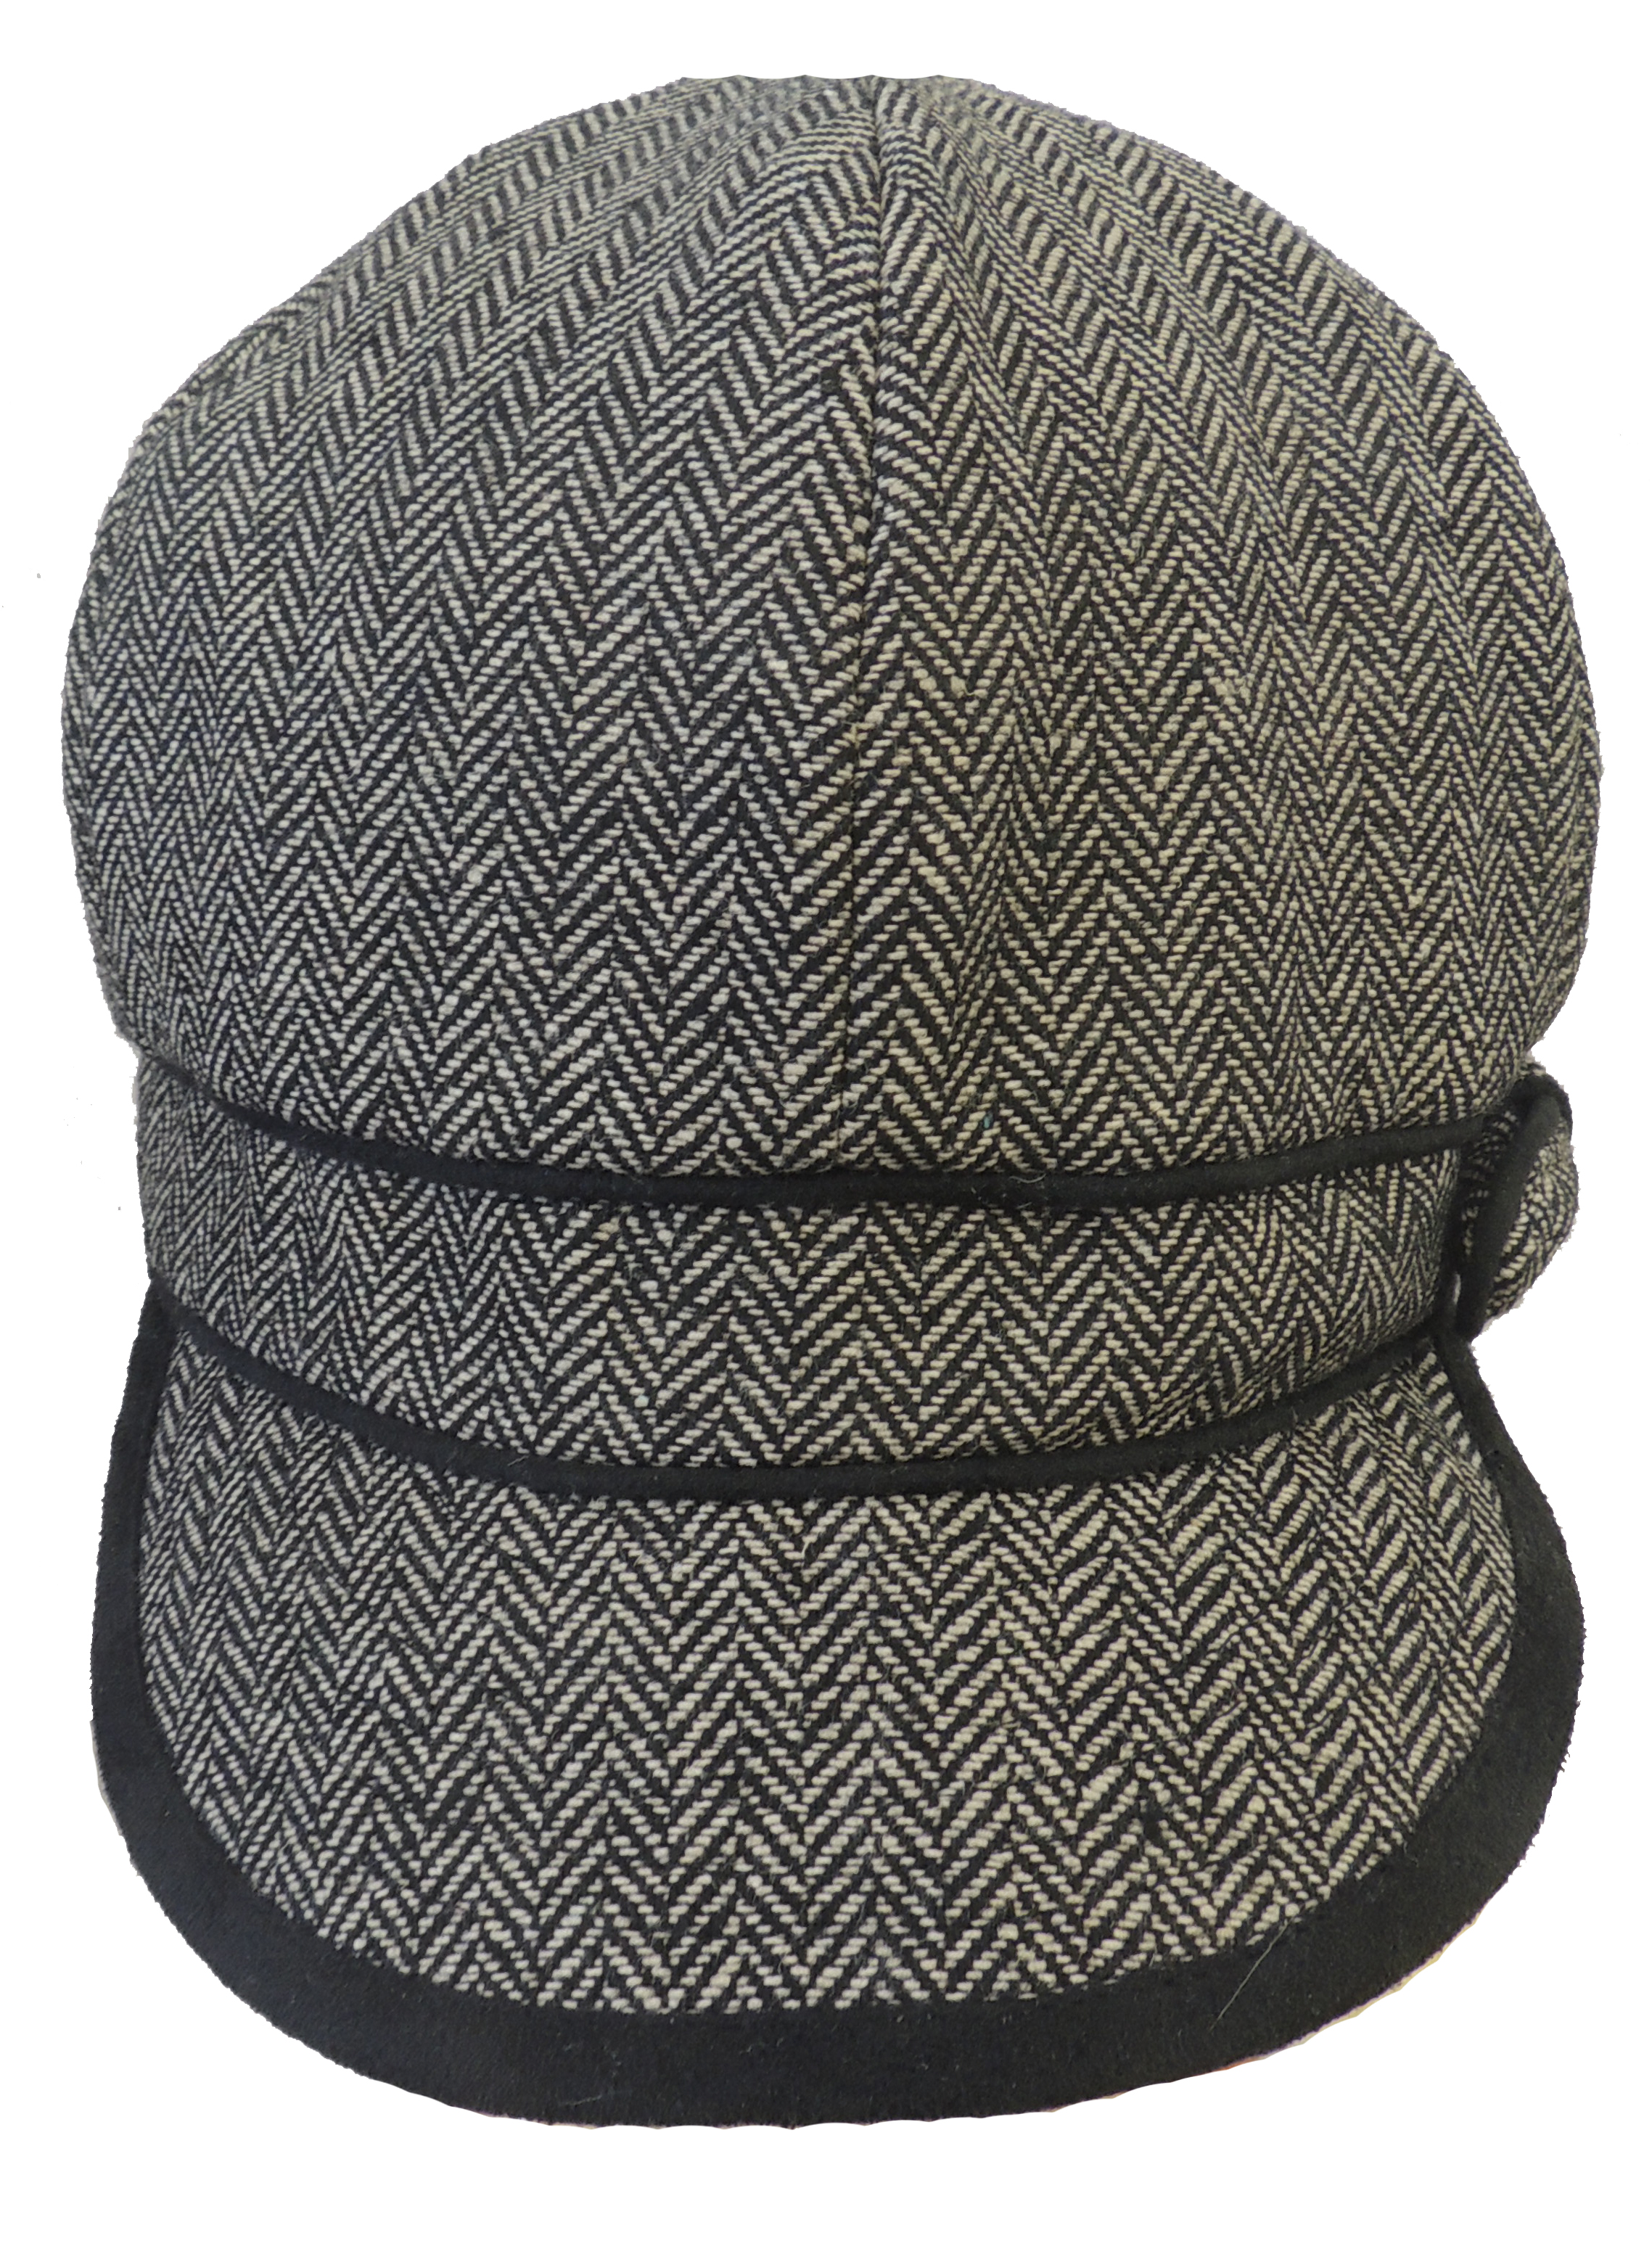 New Ladies VTG 1920s 30s Gatsby Tweed-style Herringbone Baker boy Cap Hat 91e2ed7f875a